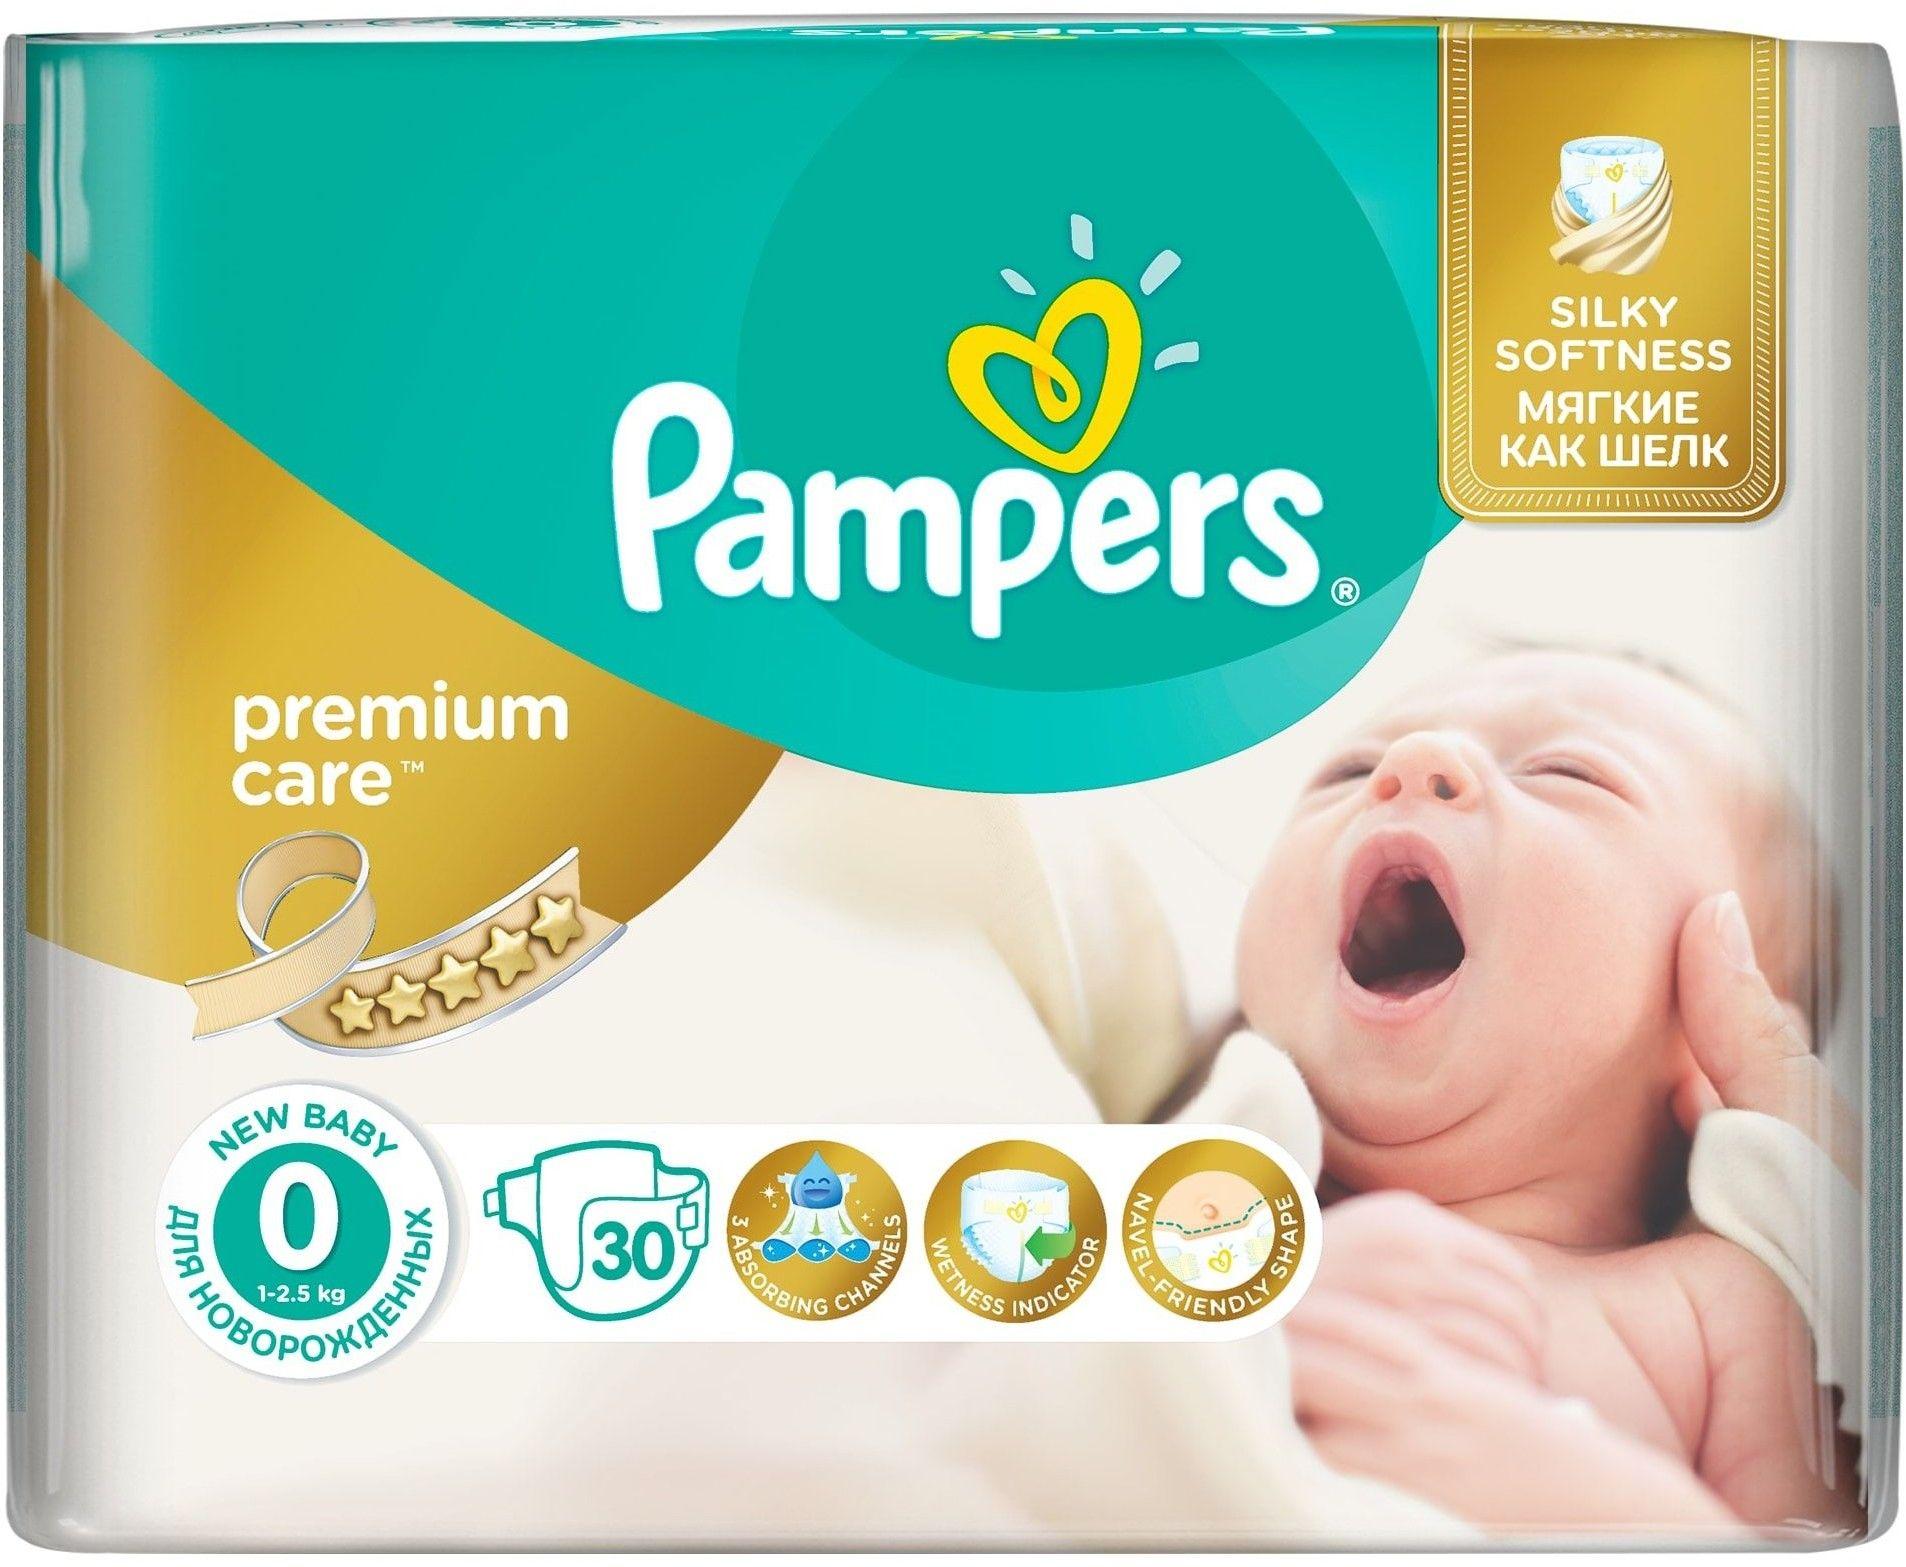 Pampers Pieluszki Premium Care Rozmiar 0